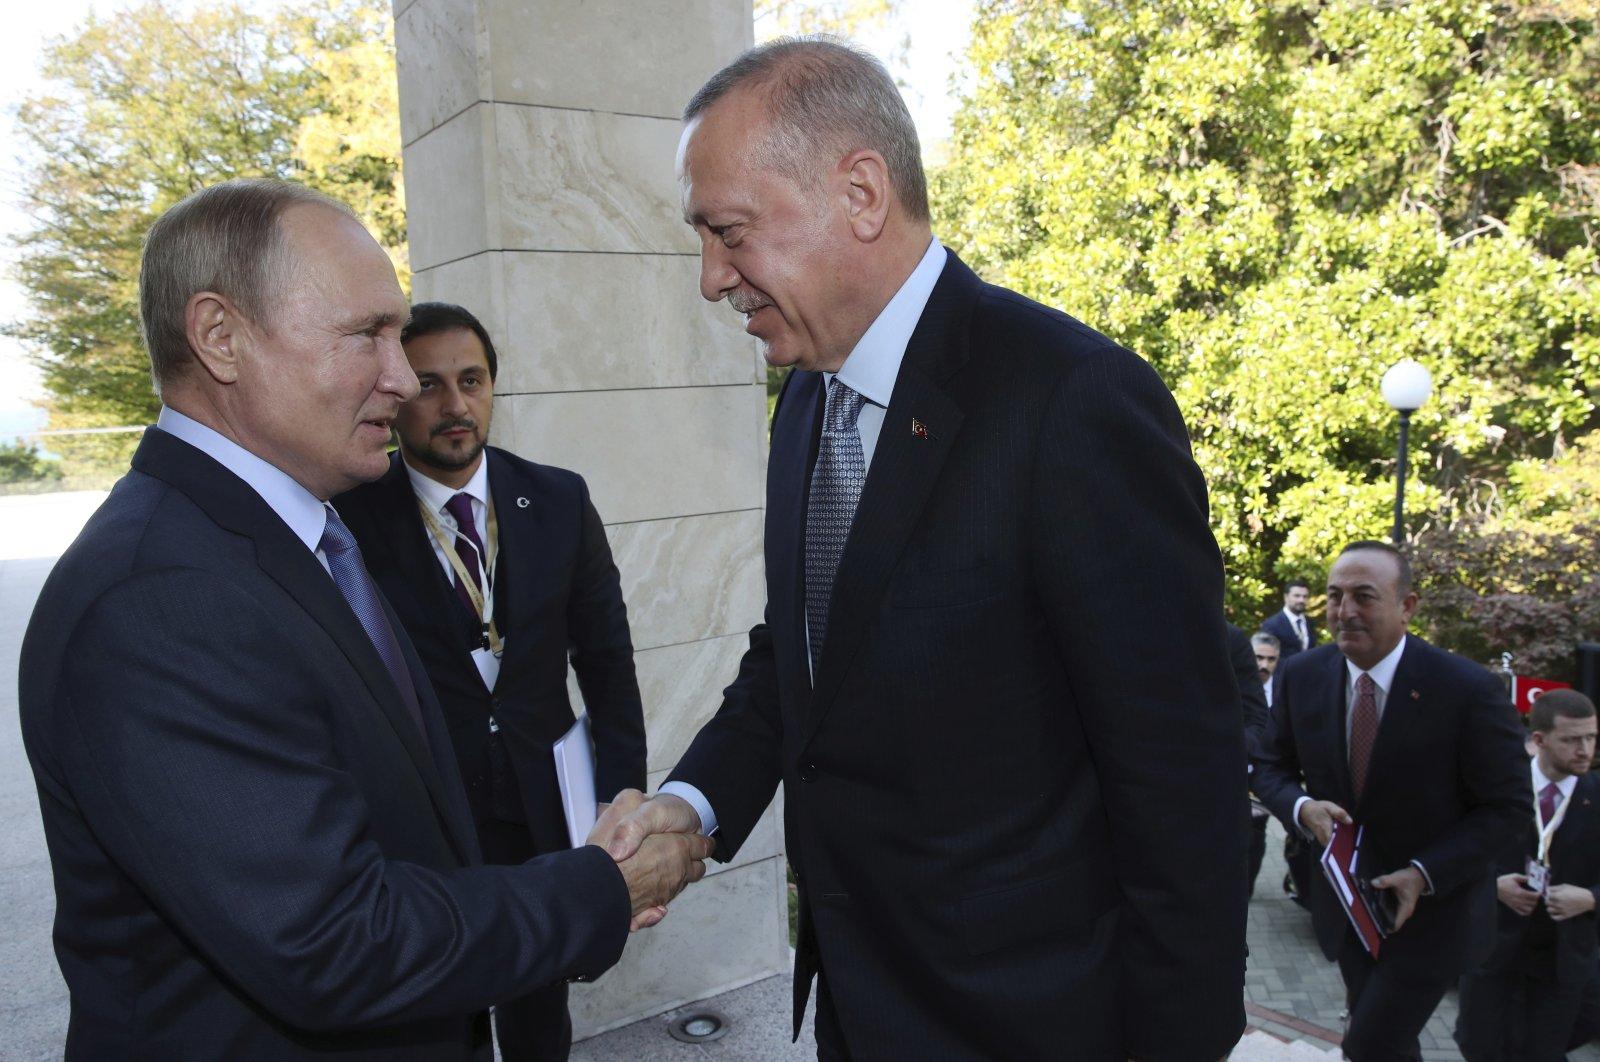 Russian President Vladimir Putin (L) and Turkish President Recep Tayyip Erdoğan shake hands before their meeting in the Bocharov Ruchei residence in the Black Sea resort of Sochi, Russia, Oct. 22, 2019. (AP Photo)